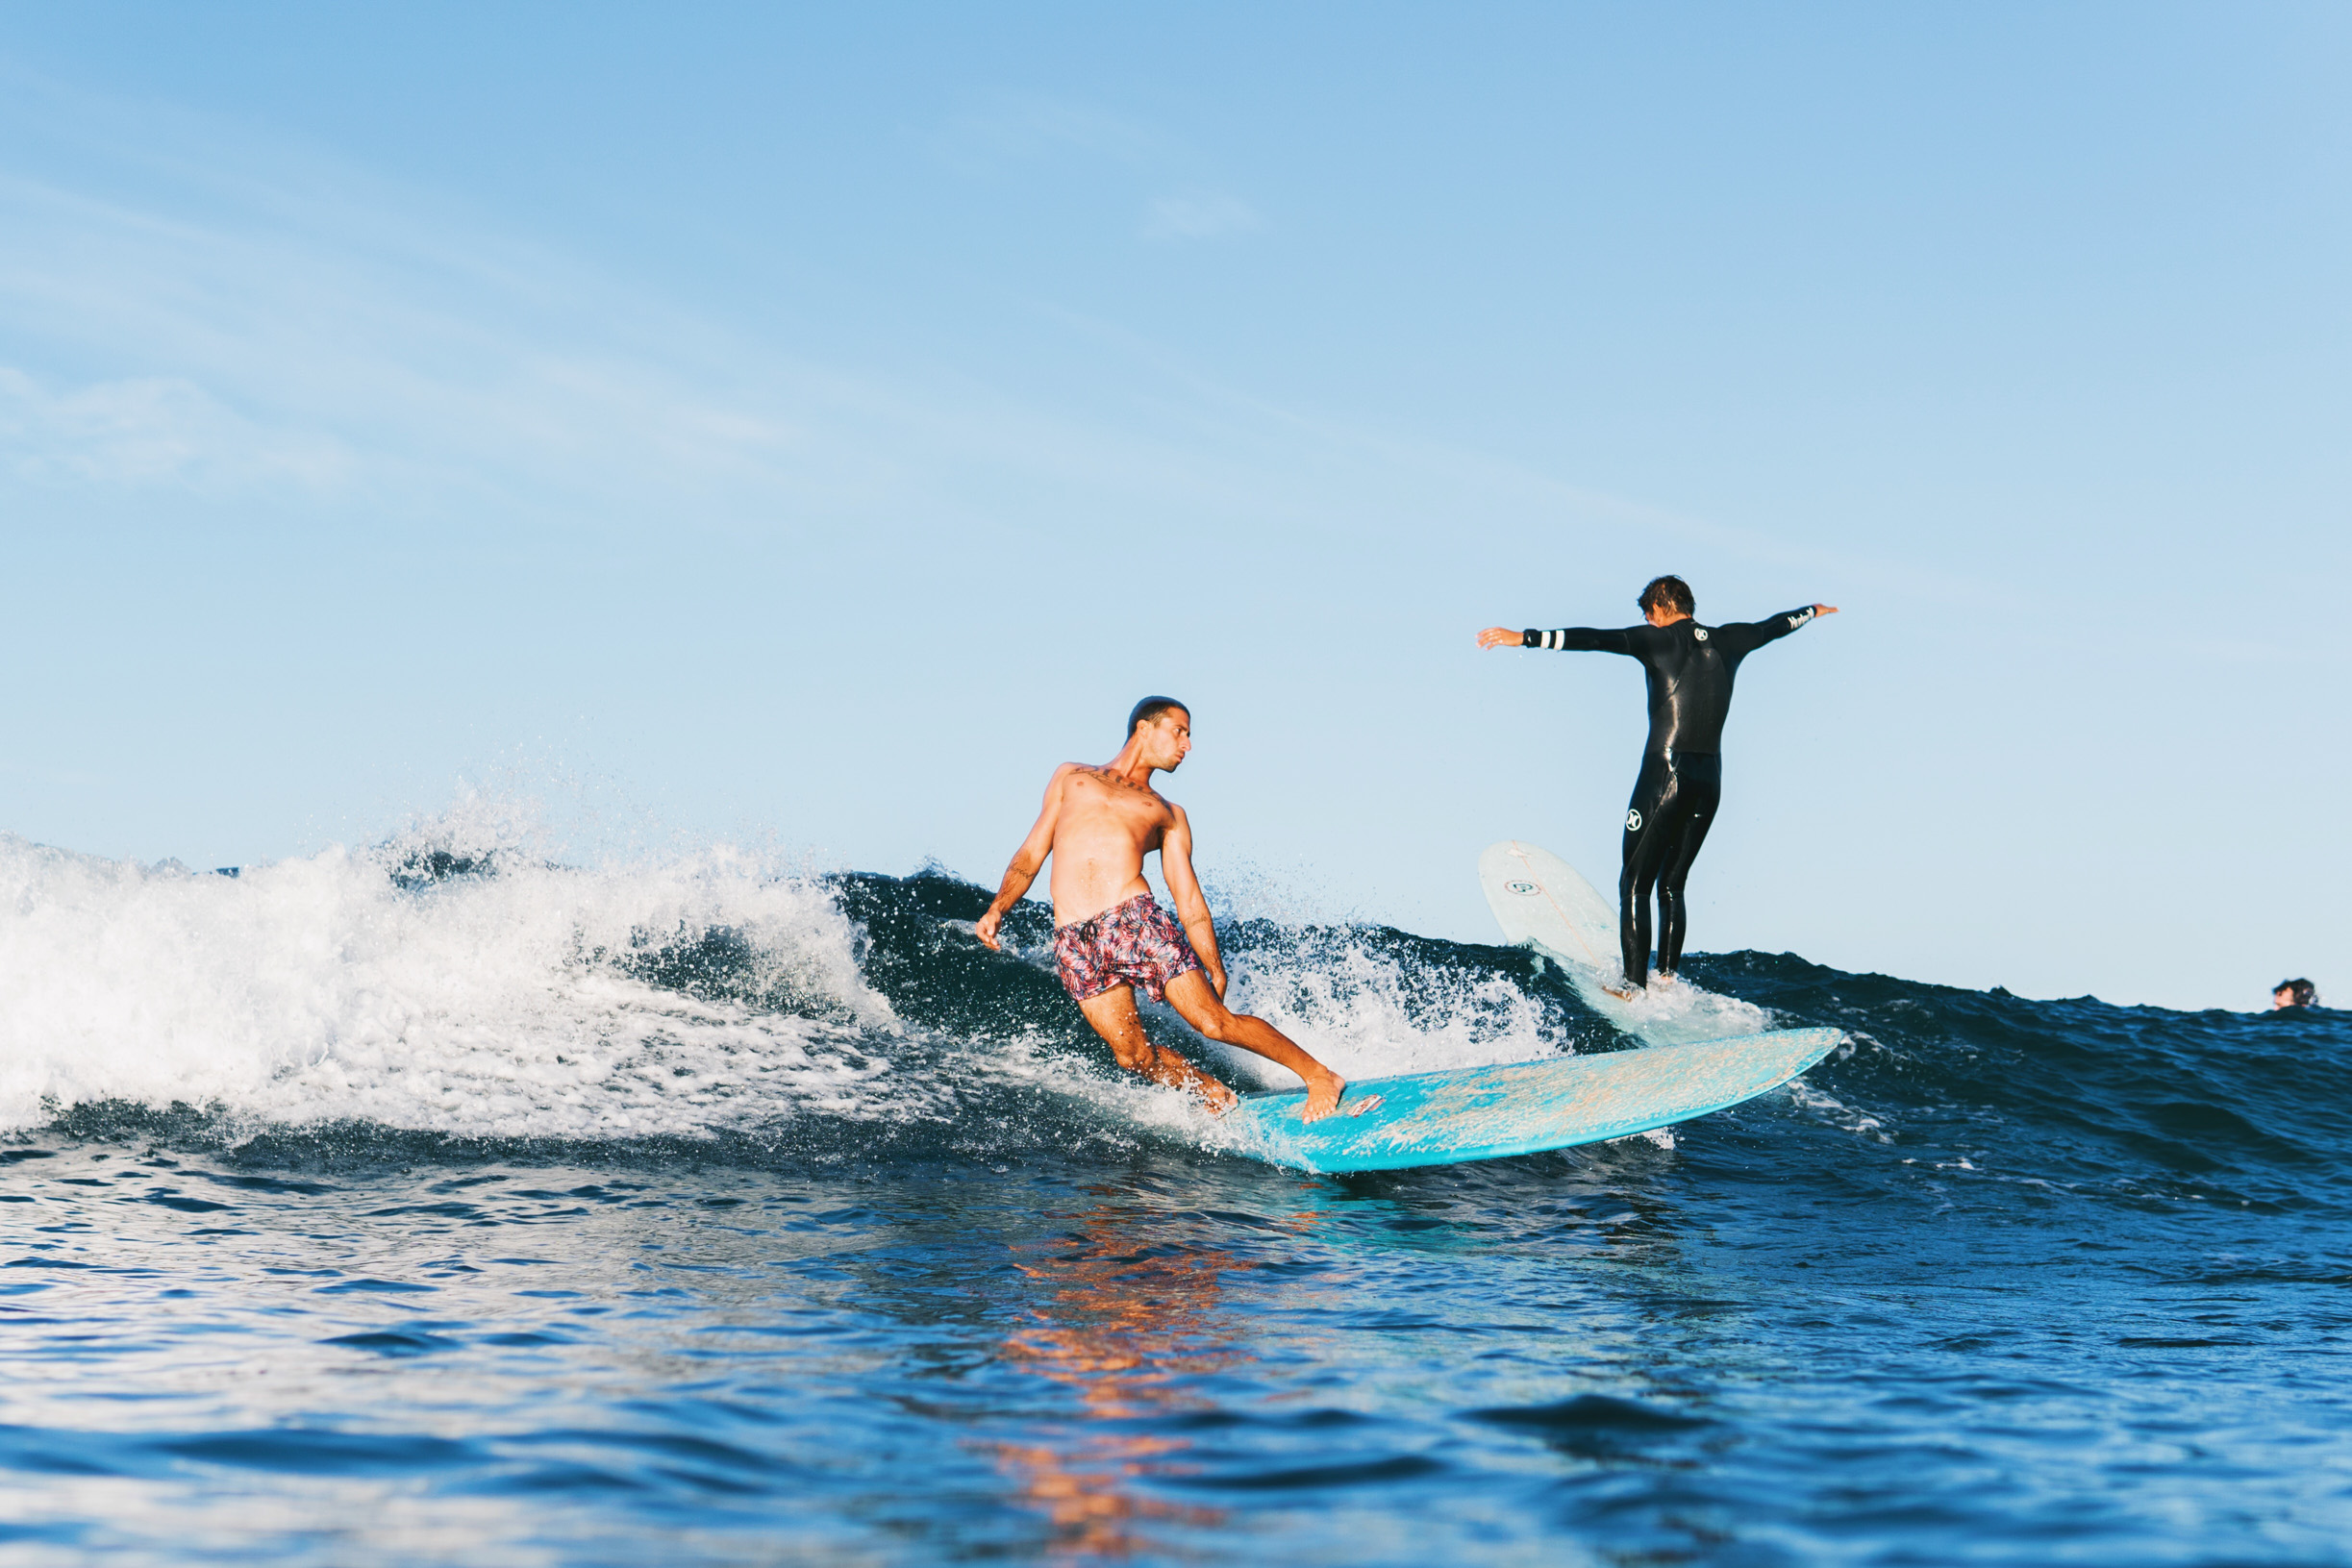 Surf-Mexico-Zihuatanejo-Sayulita-Ixtapa-Zihuatanejo-Diego-Cadena-Olas-Fotografia-Heiko-Bothe-4.jpg